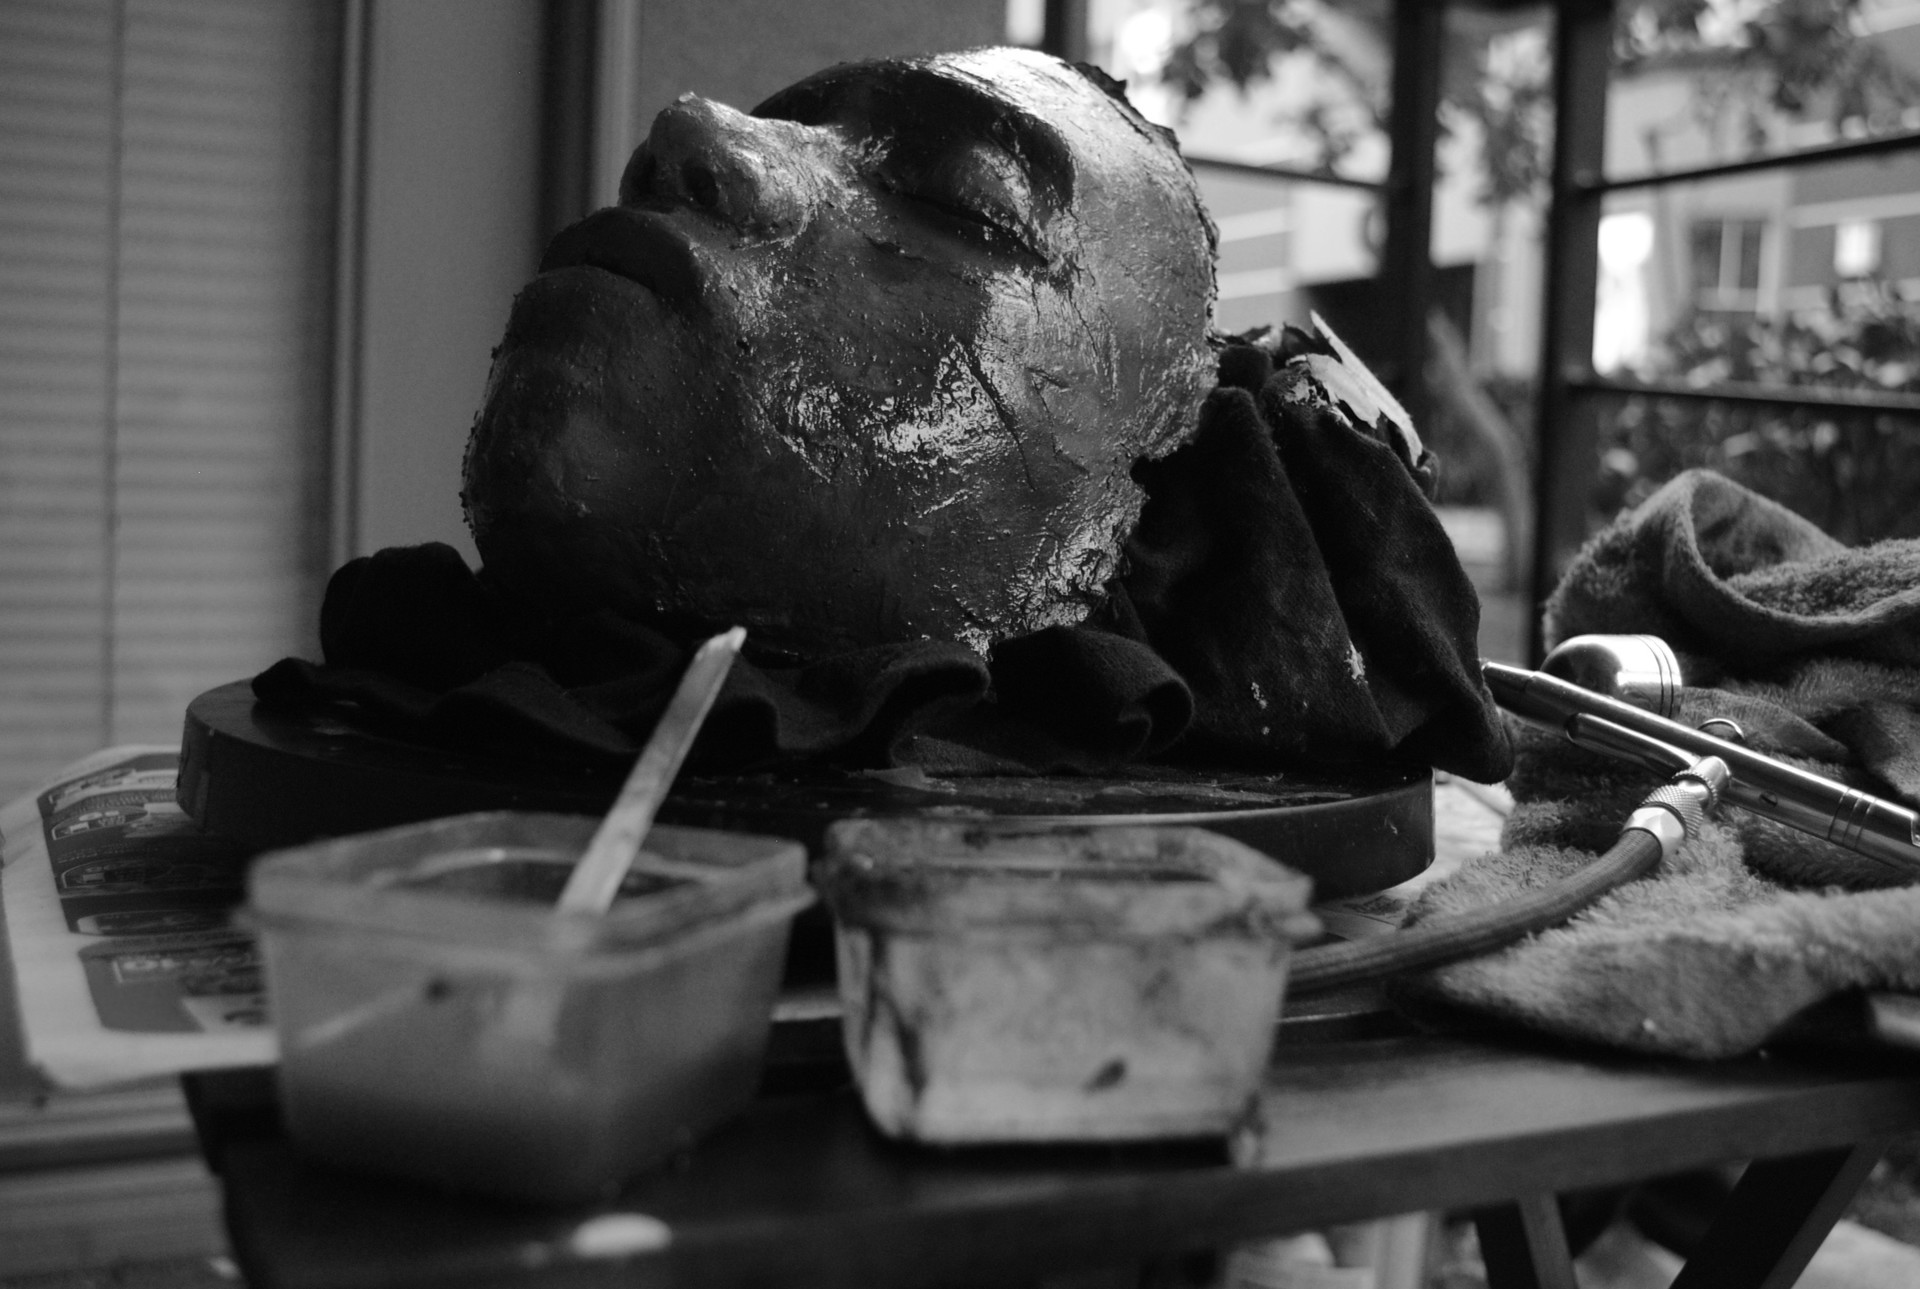 Death Mask - Plain (2010 - 2012 Silicone Masks)